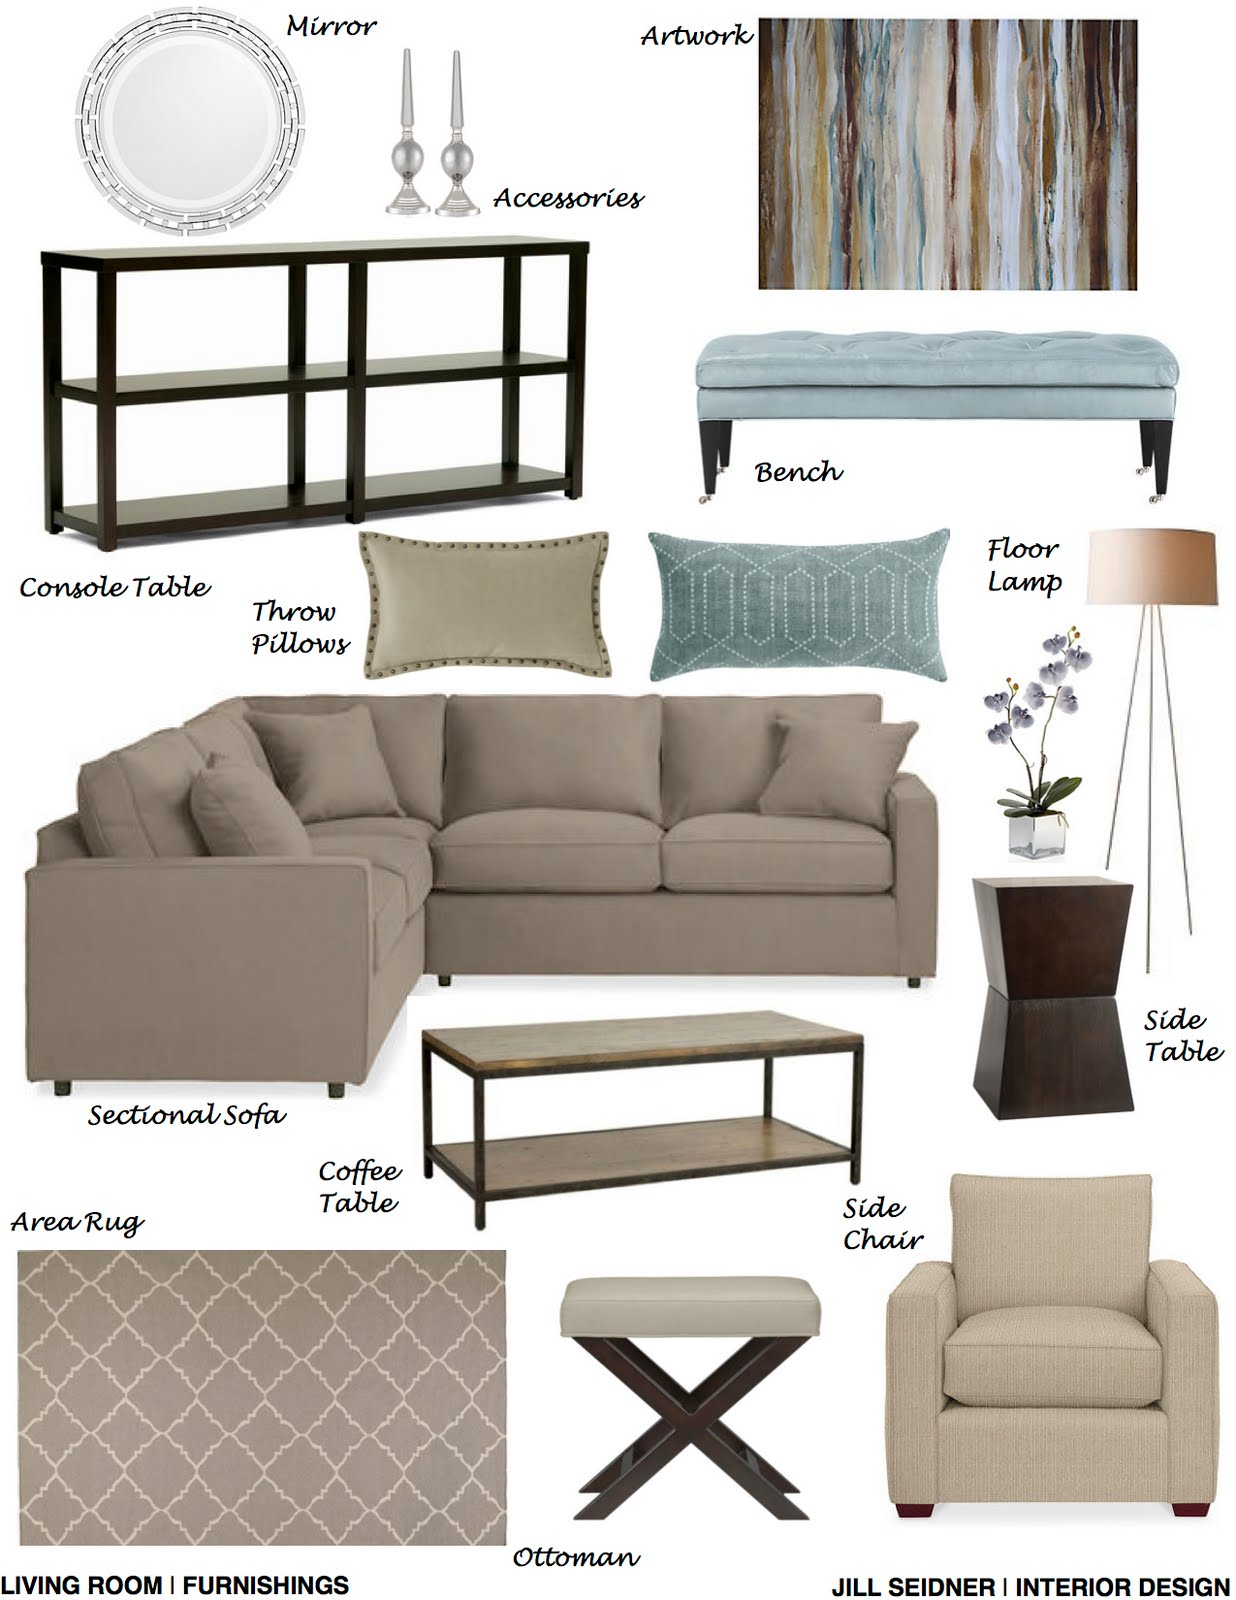 JILL SEIDNER INTERIOR DESIGN Online Design E Decorating Services